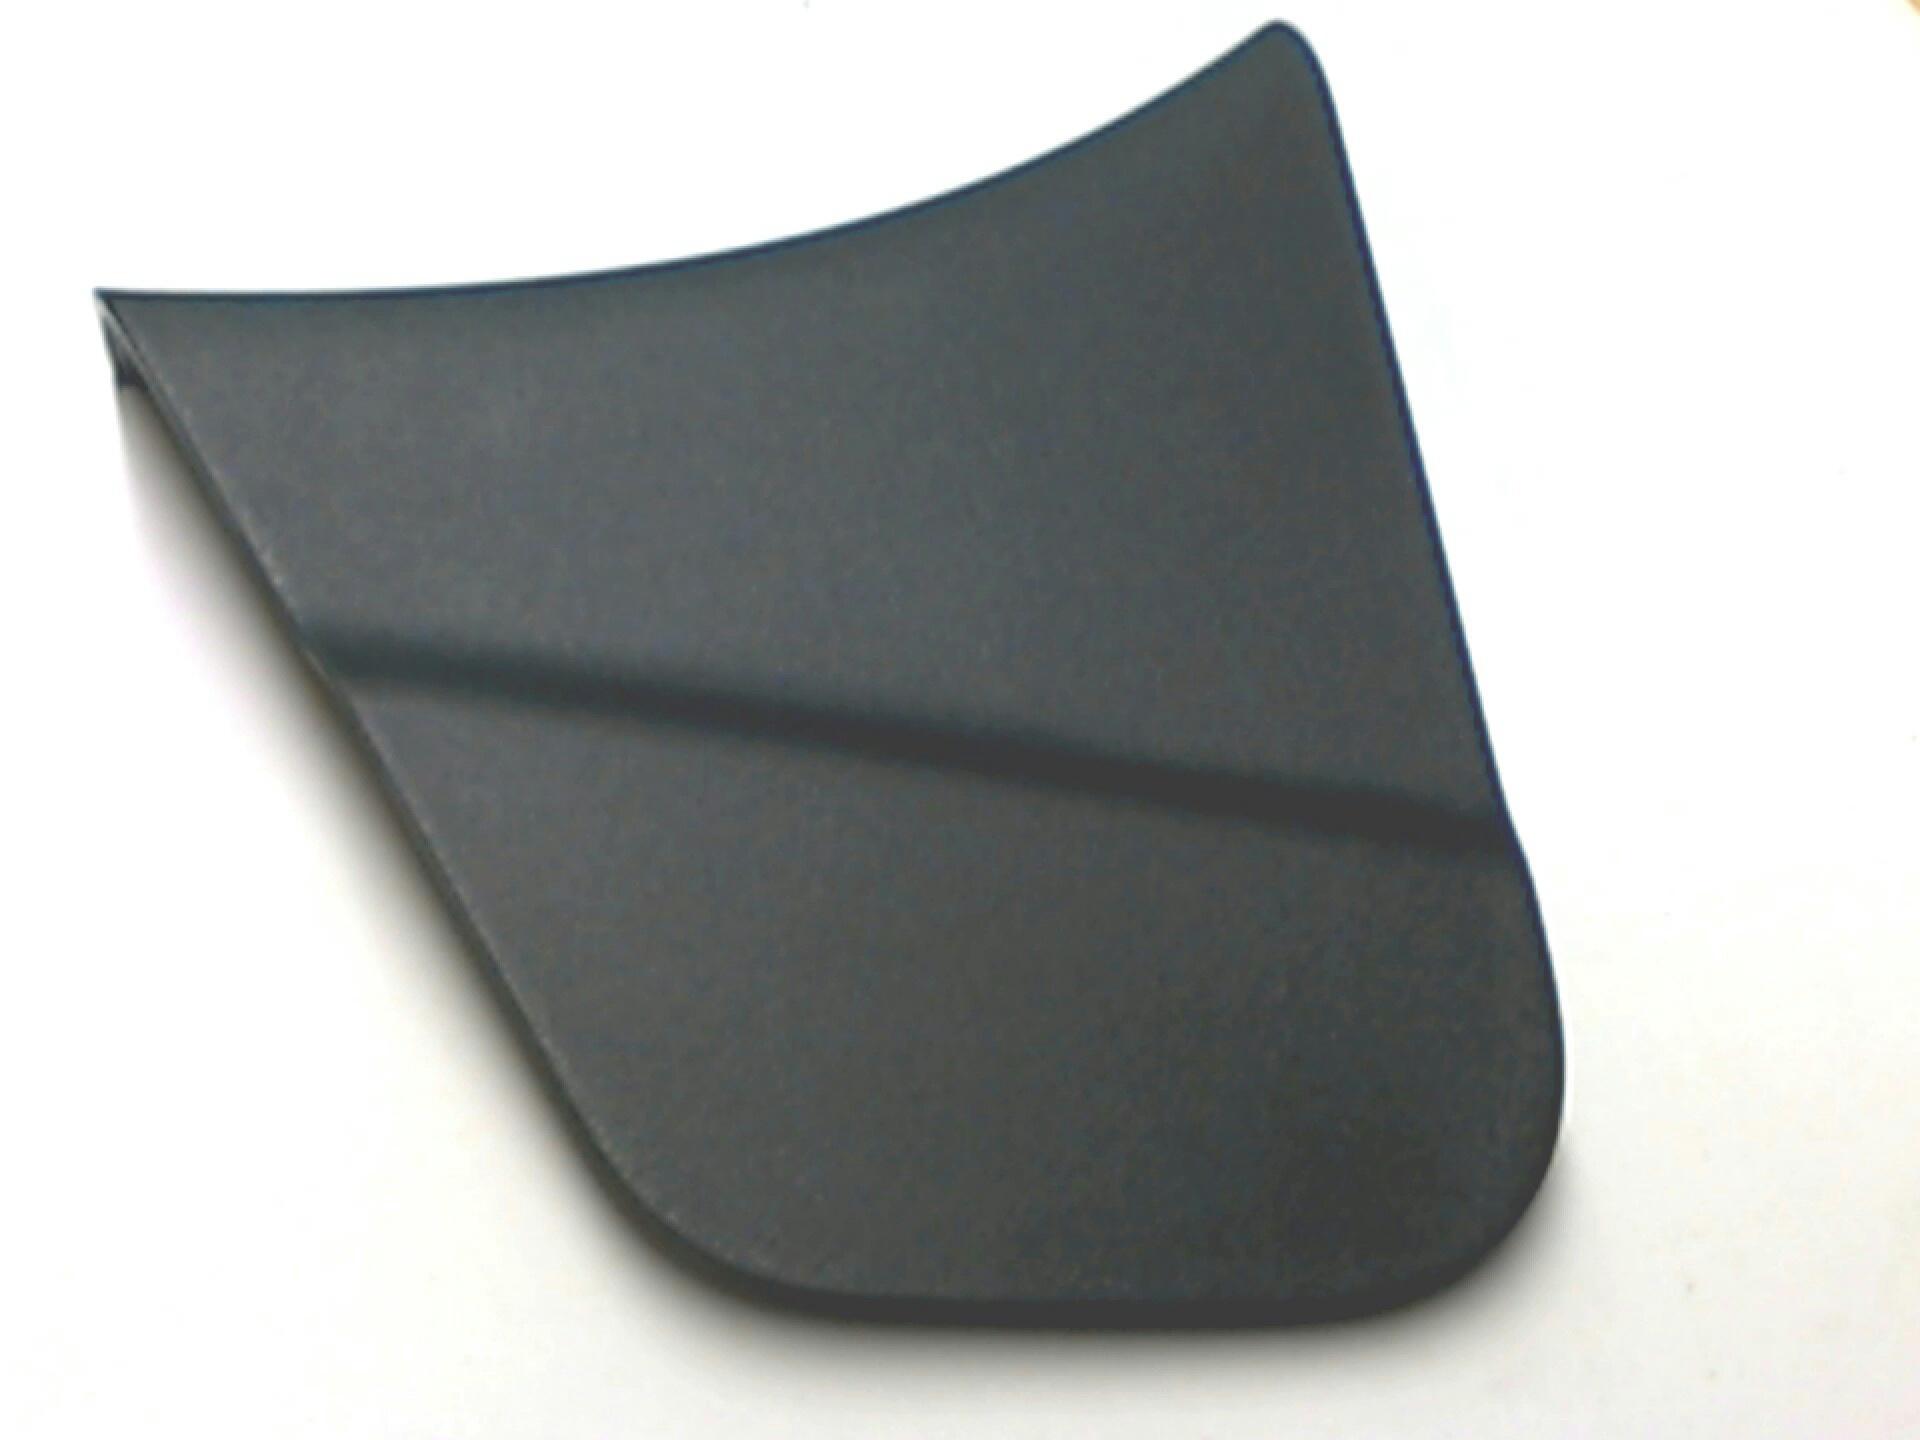 2013 Dodge Durango Cover Front Left Seat Belt Anchor